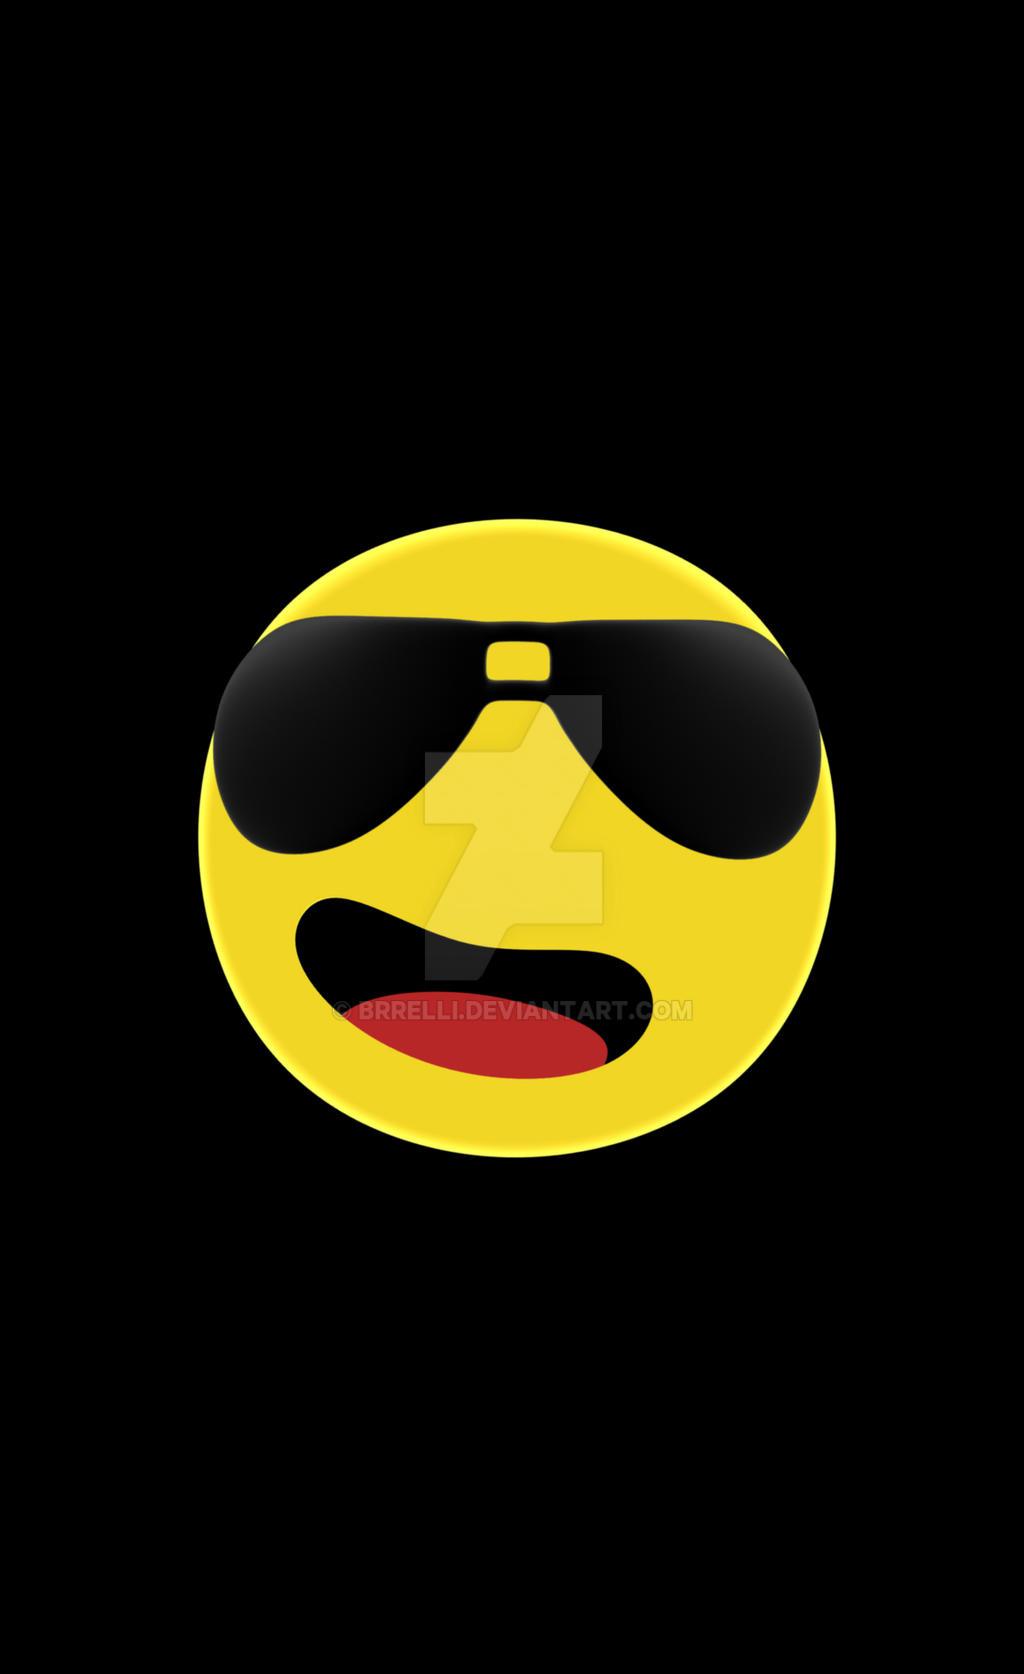 Cool Emoji Windows Phone 3D Model Wallpaper By Brrelli On DeviantArt